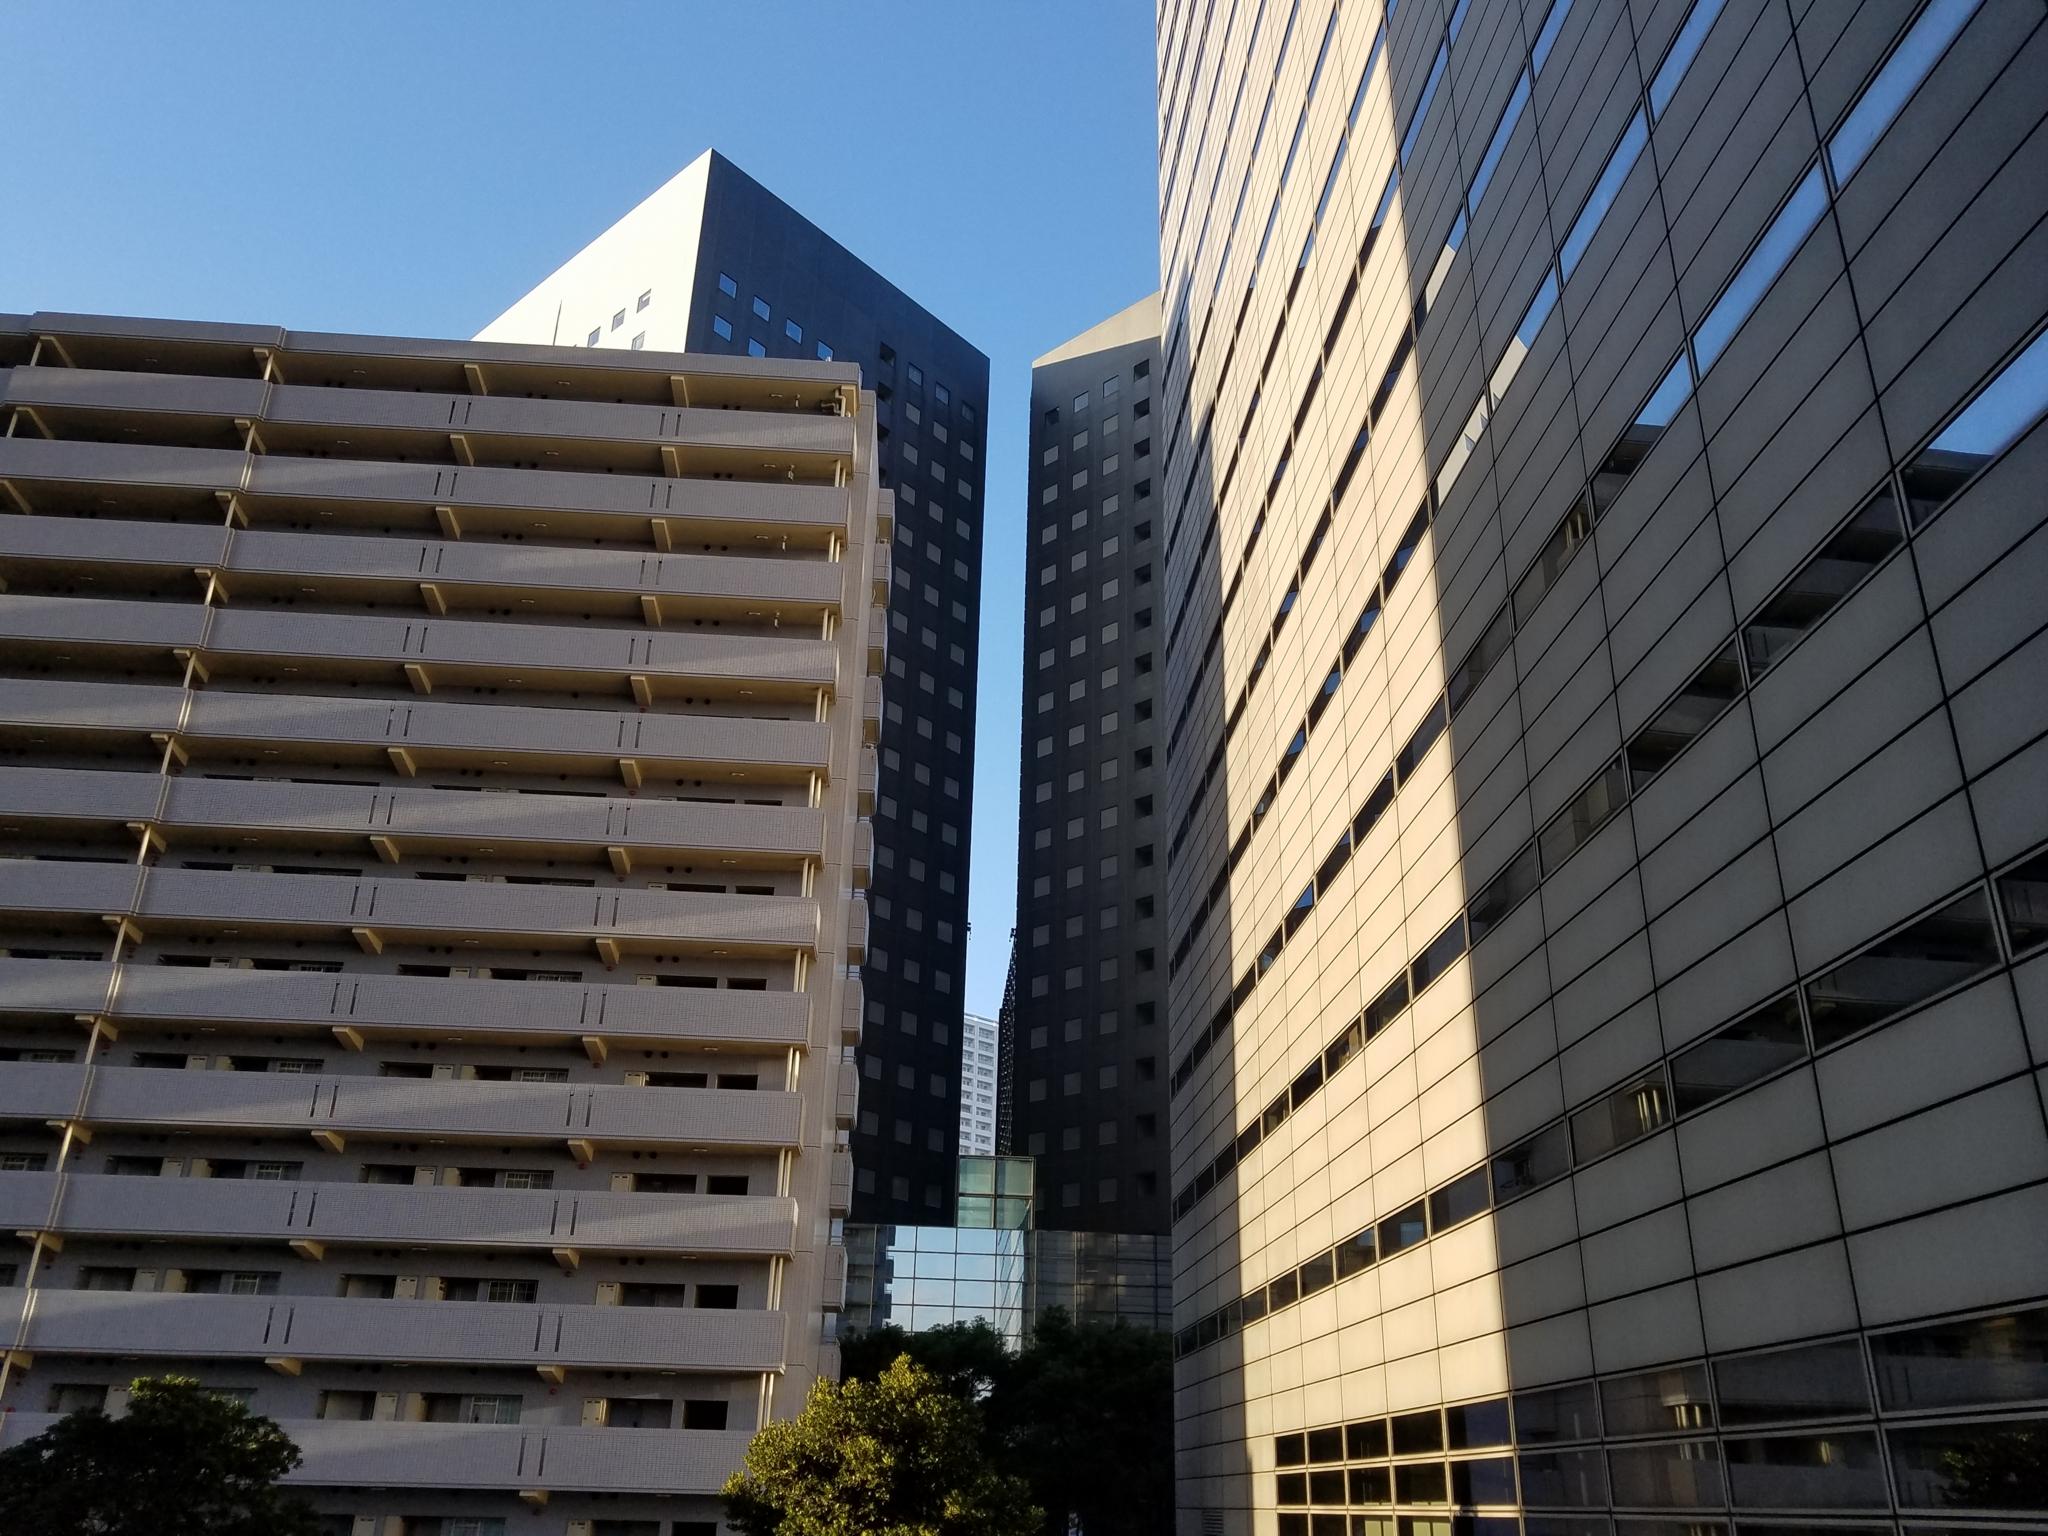 f:id:ToshUeno:20161112070722j:plain